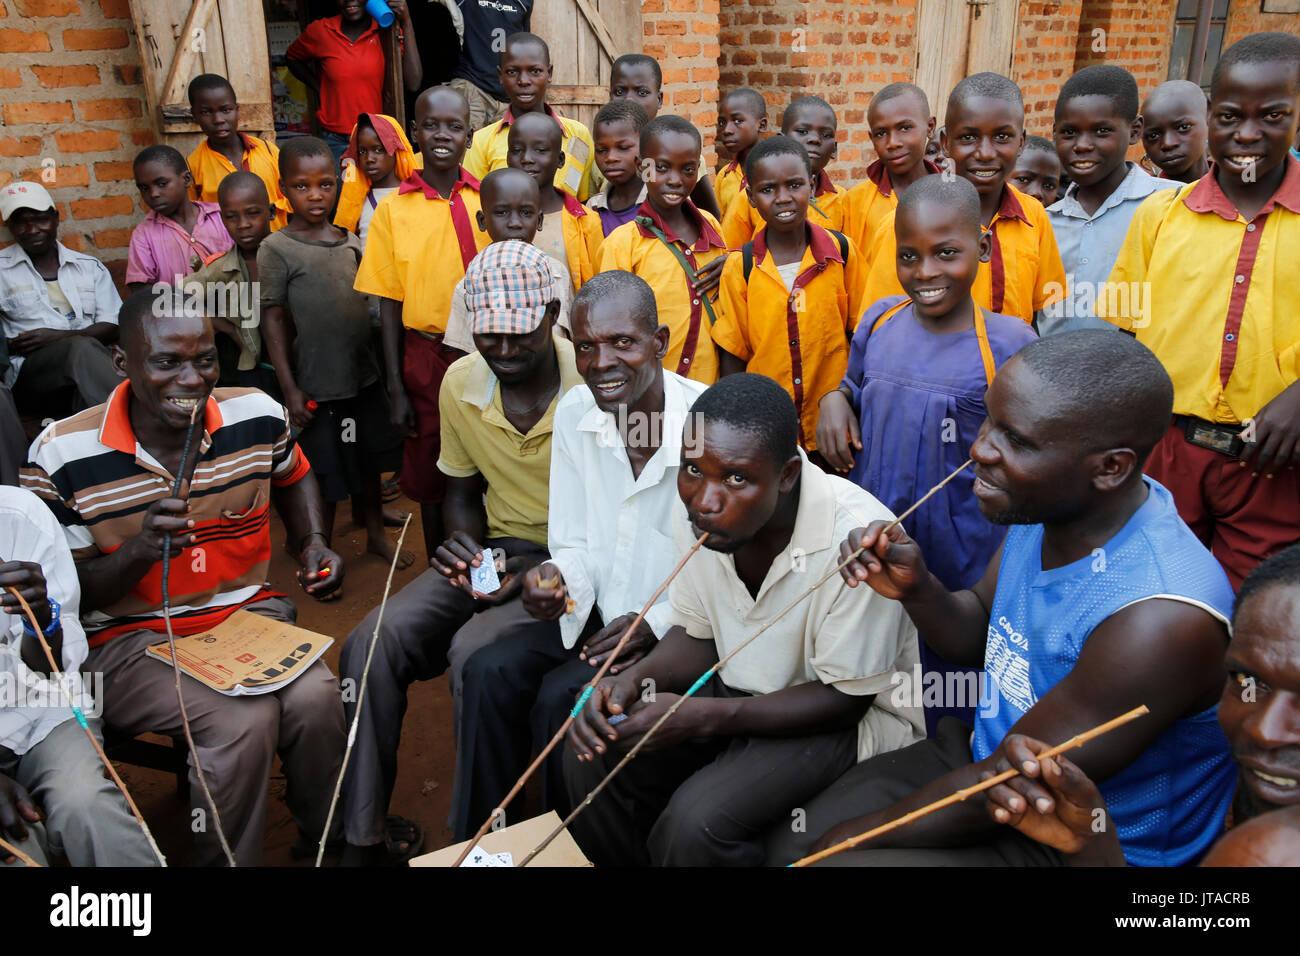 Ugandan villagers drinking home-brewed beer and schoolchildren, Bweyale, Uganda, Africa - Stock Image